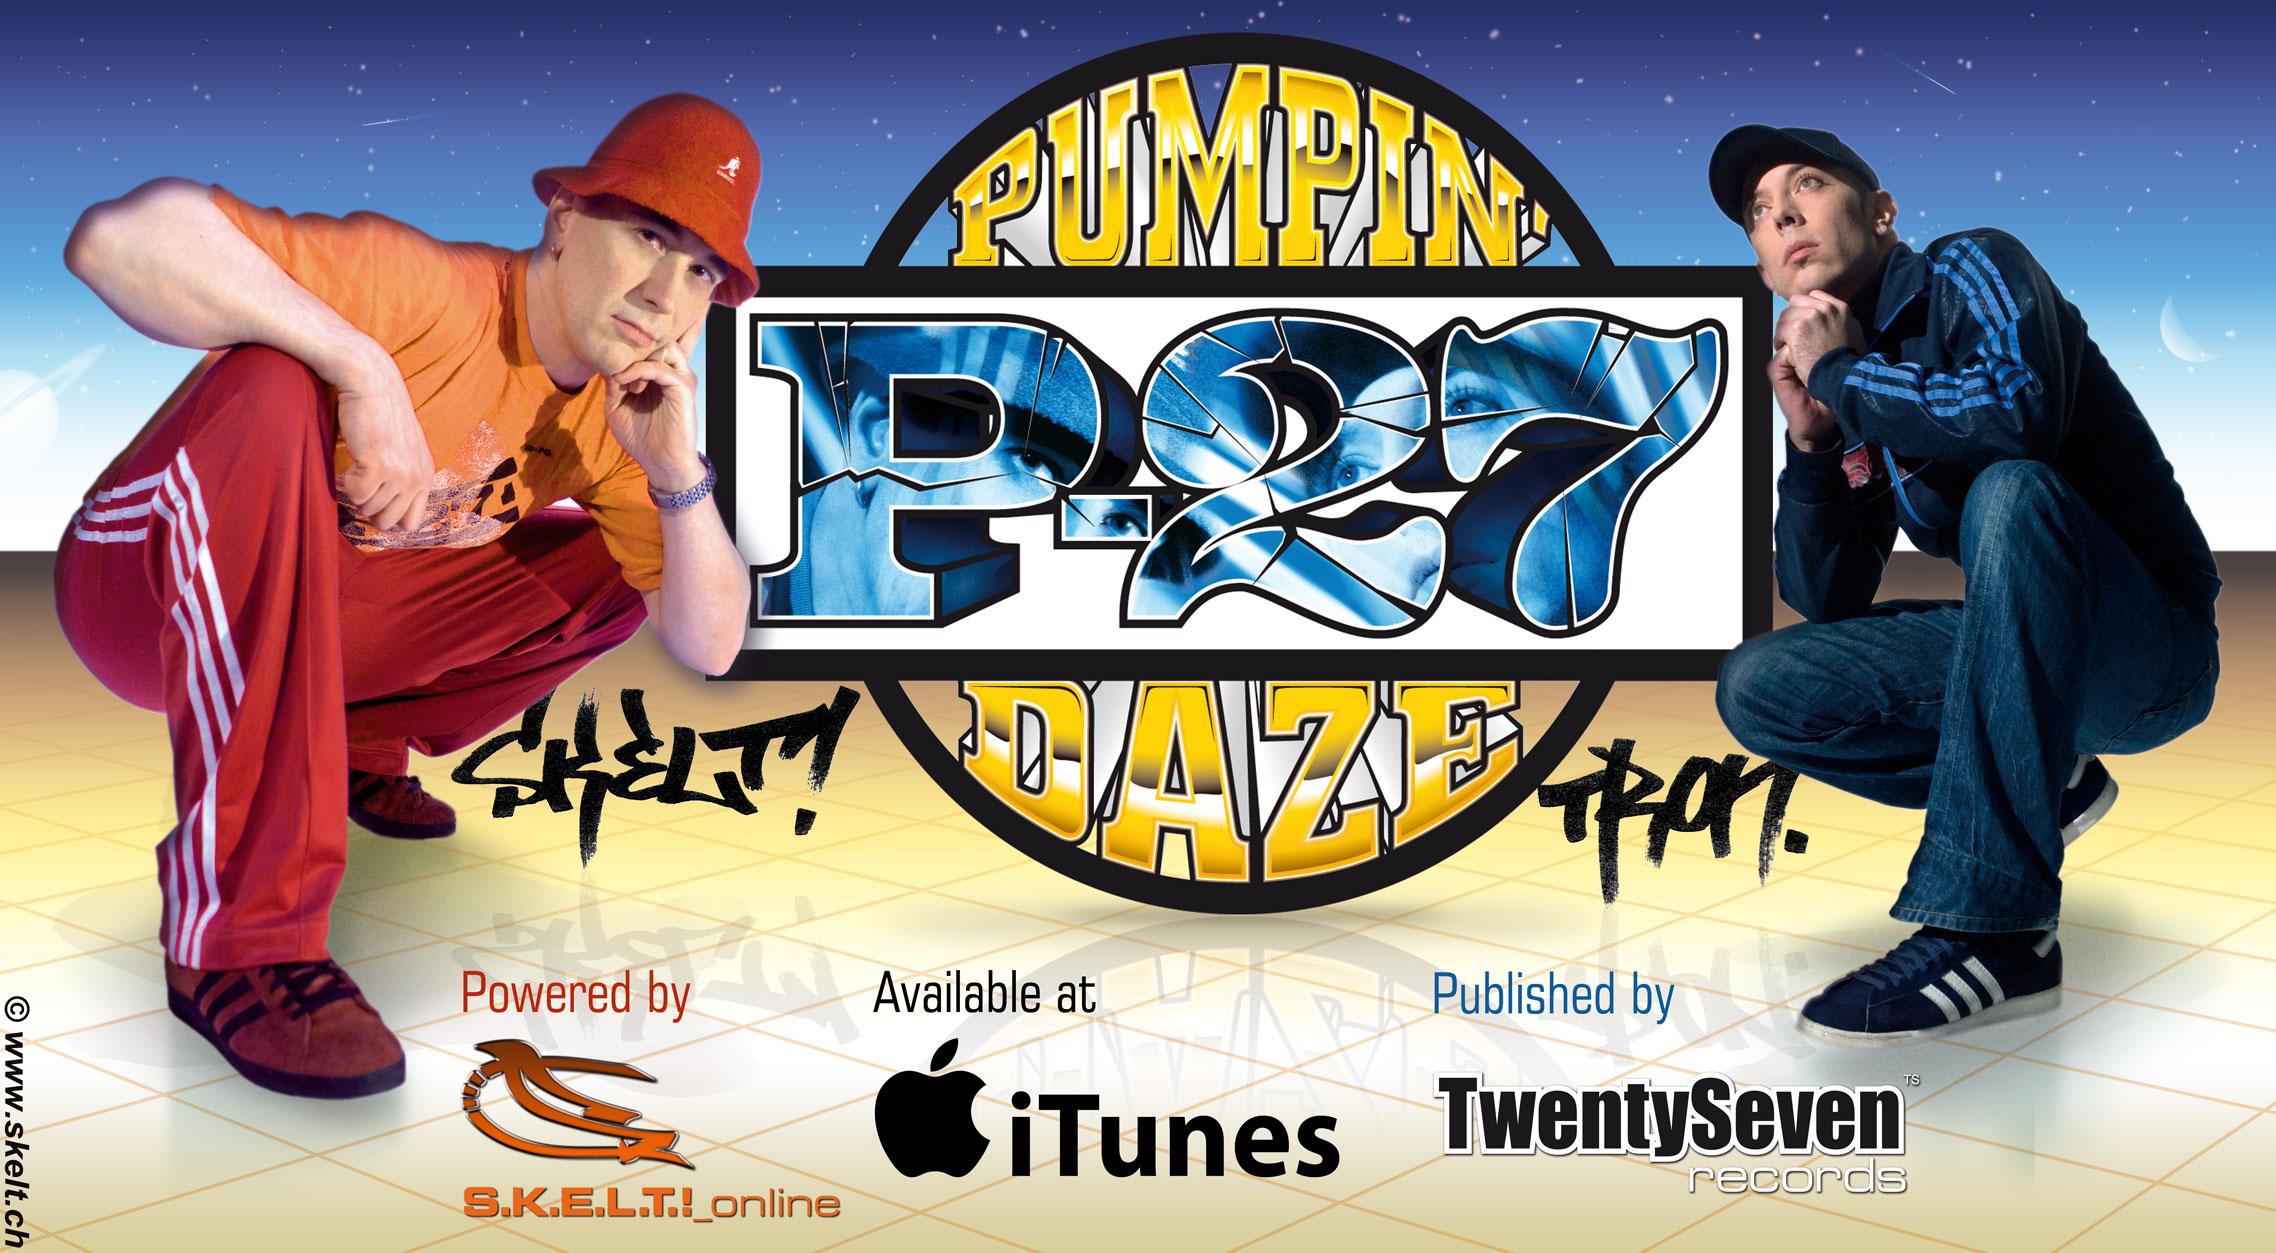 P-27 - Pumpin' Daze (EP / 2007)